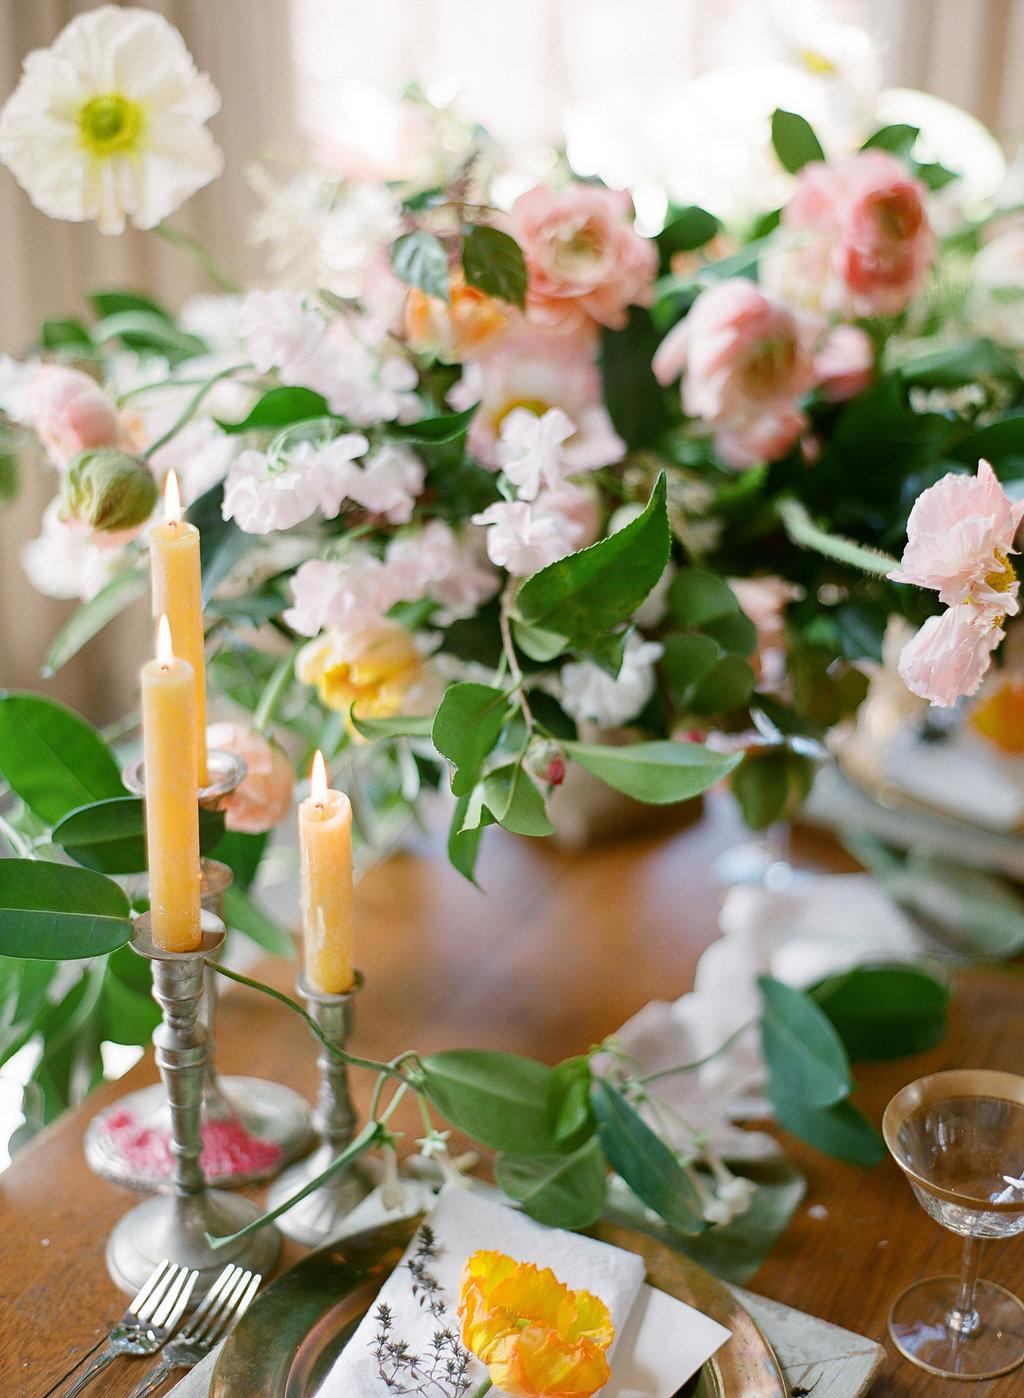 kristen_lynne_photography_early_mountain_vineyard_wedding-56